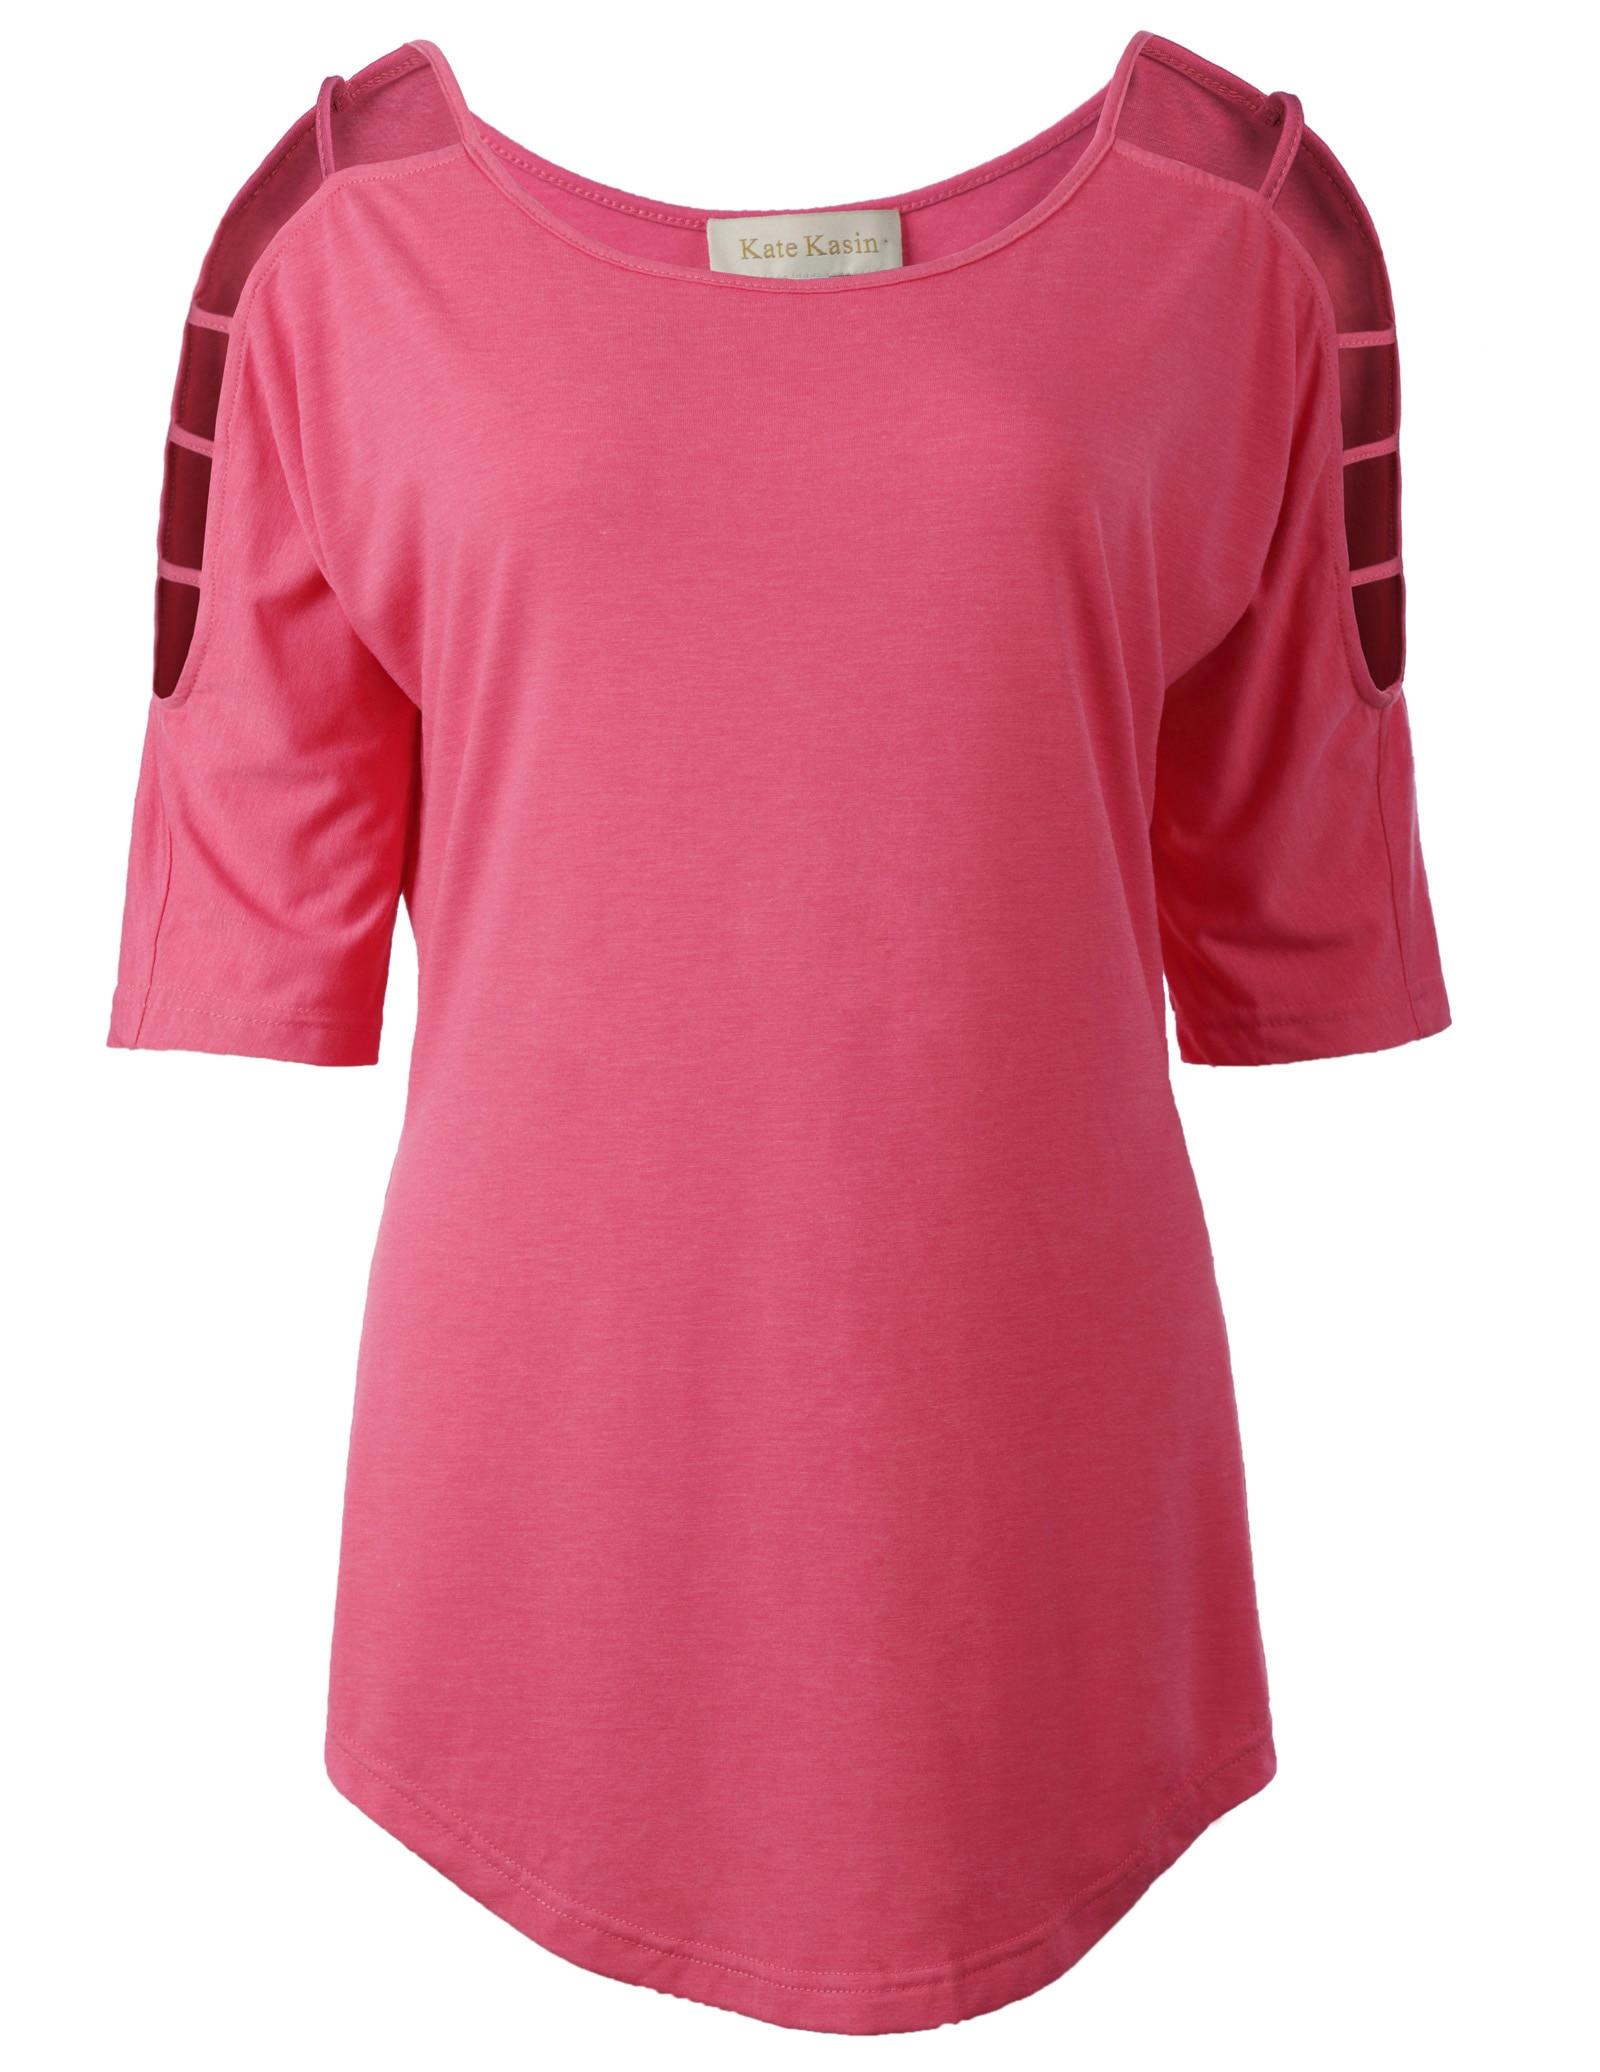 summer top for women Sexy Women Casual Loose hollow out half Sleeve Crew Neck T-Shirt Top camisas feminina